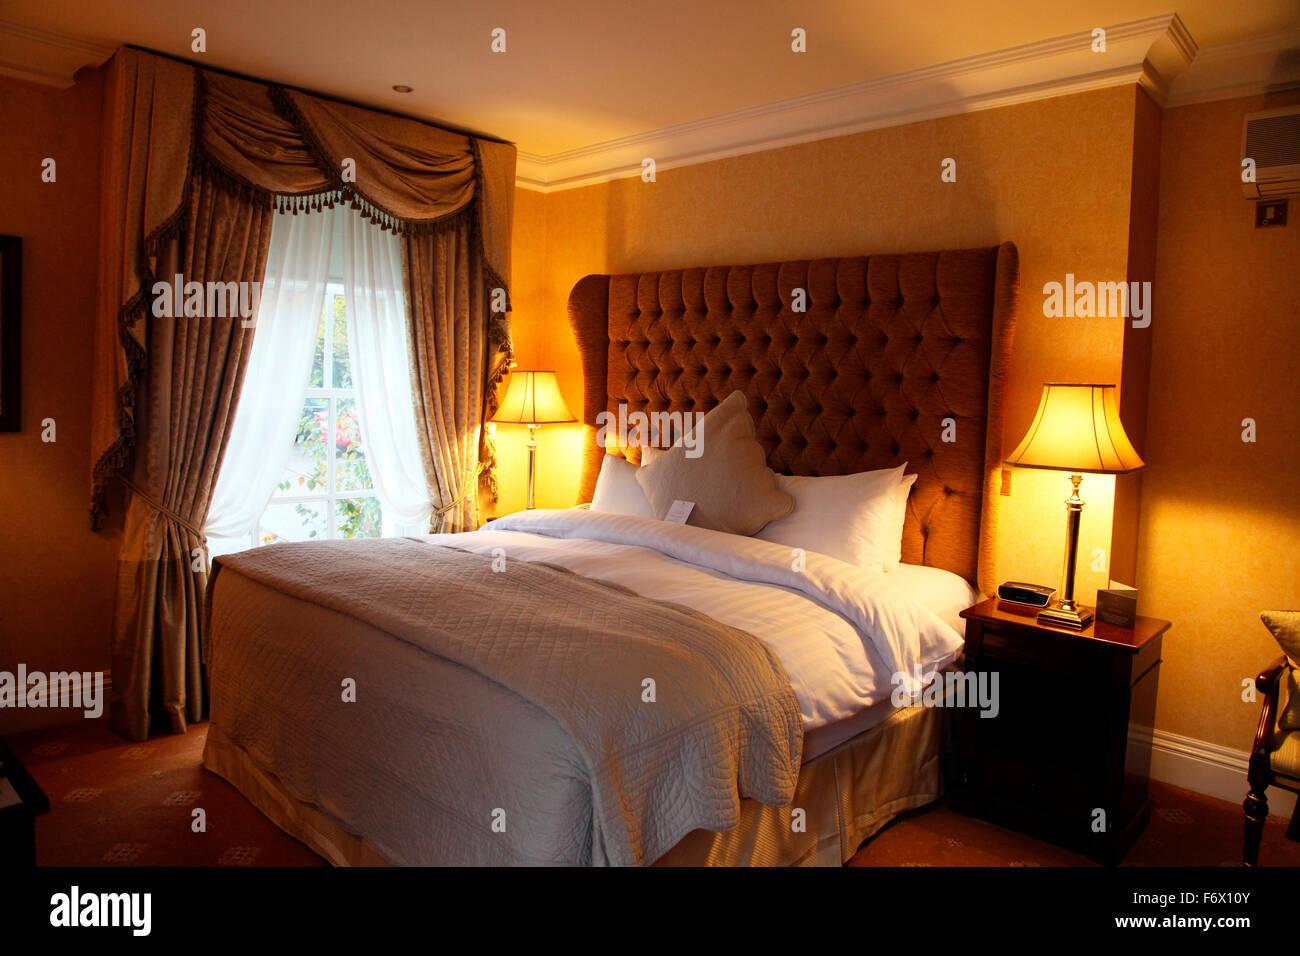 Bedroom in Hayfield Manor, now a luxury hotel - Stock Image